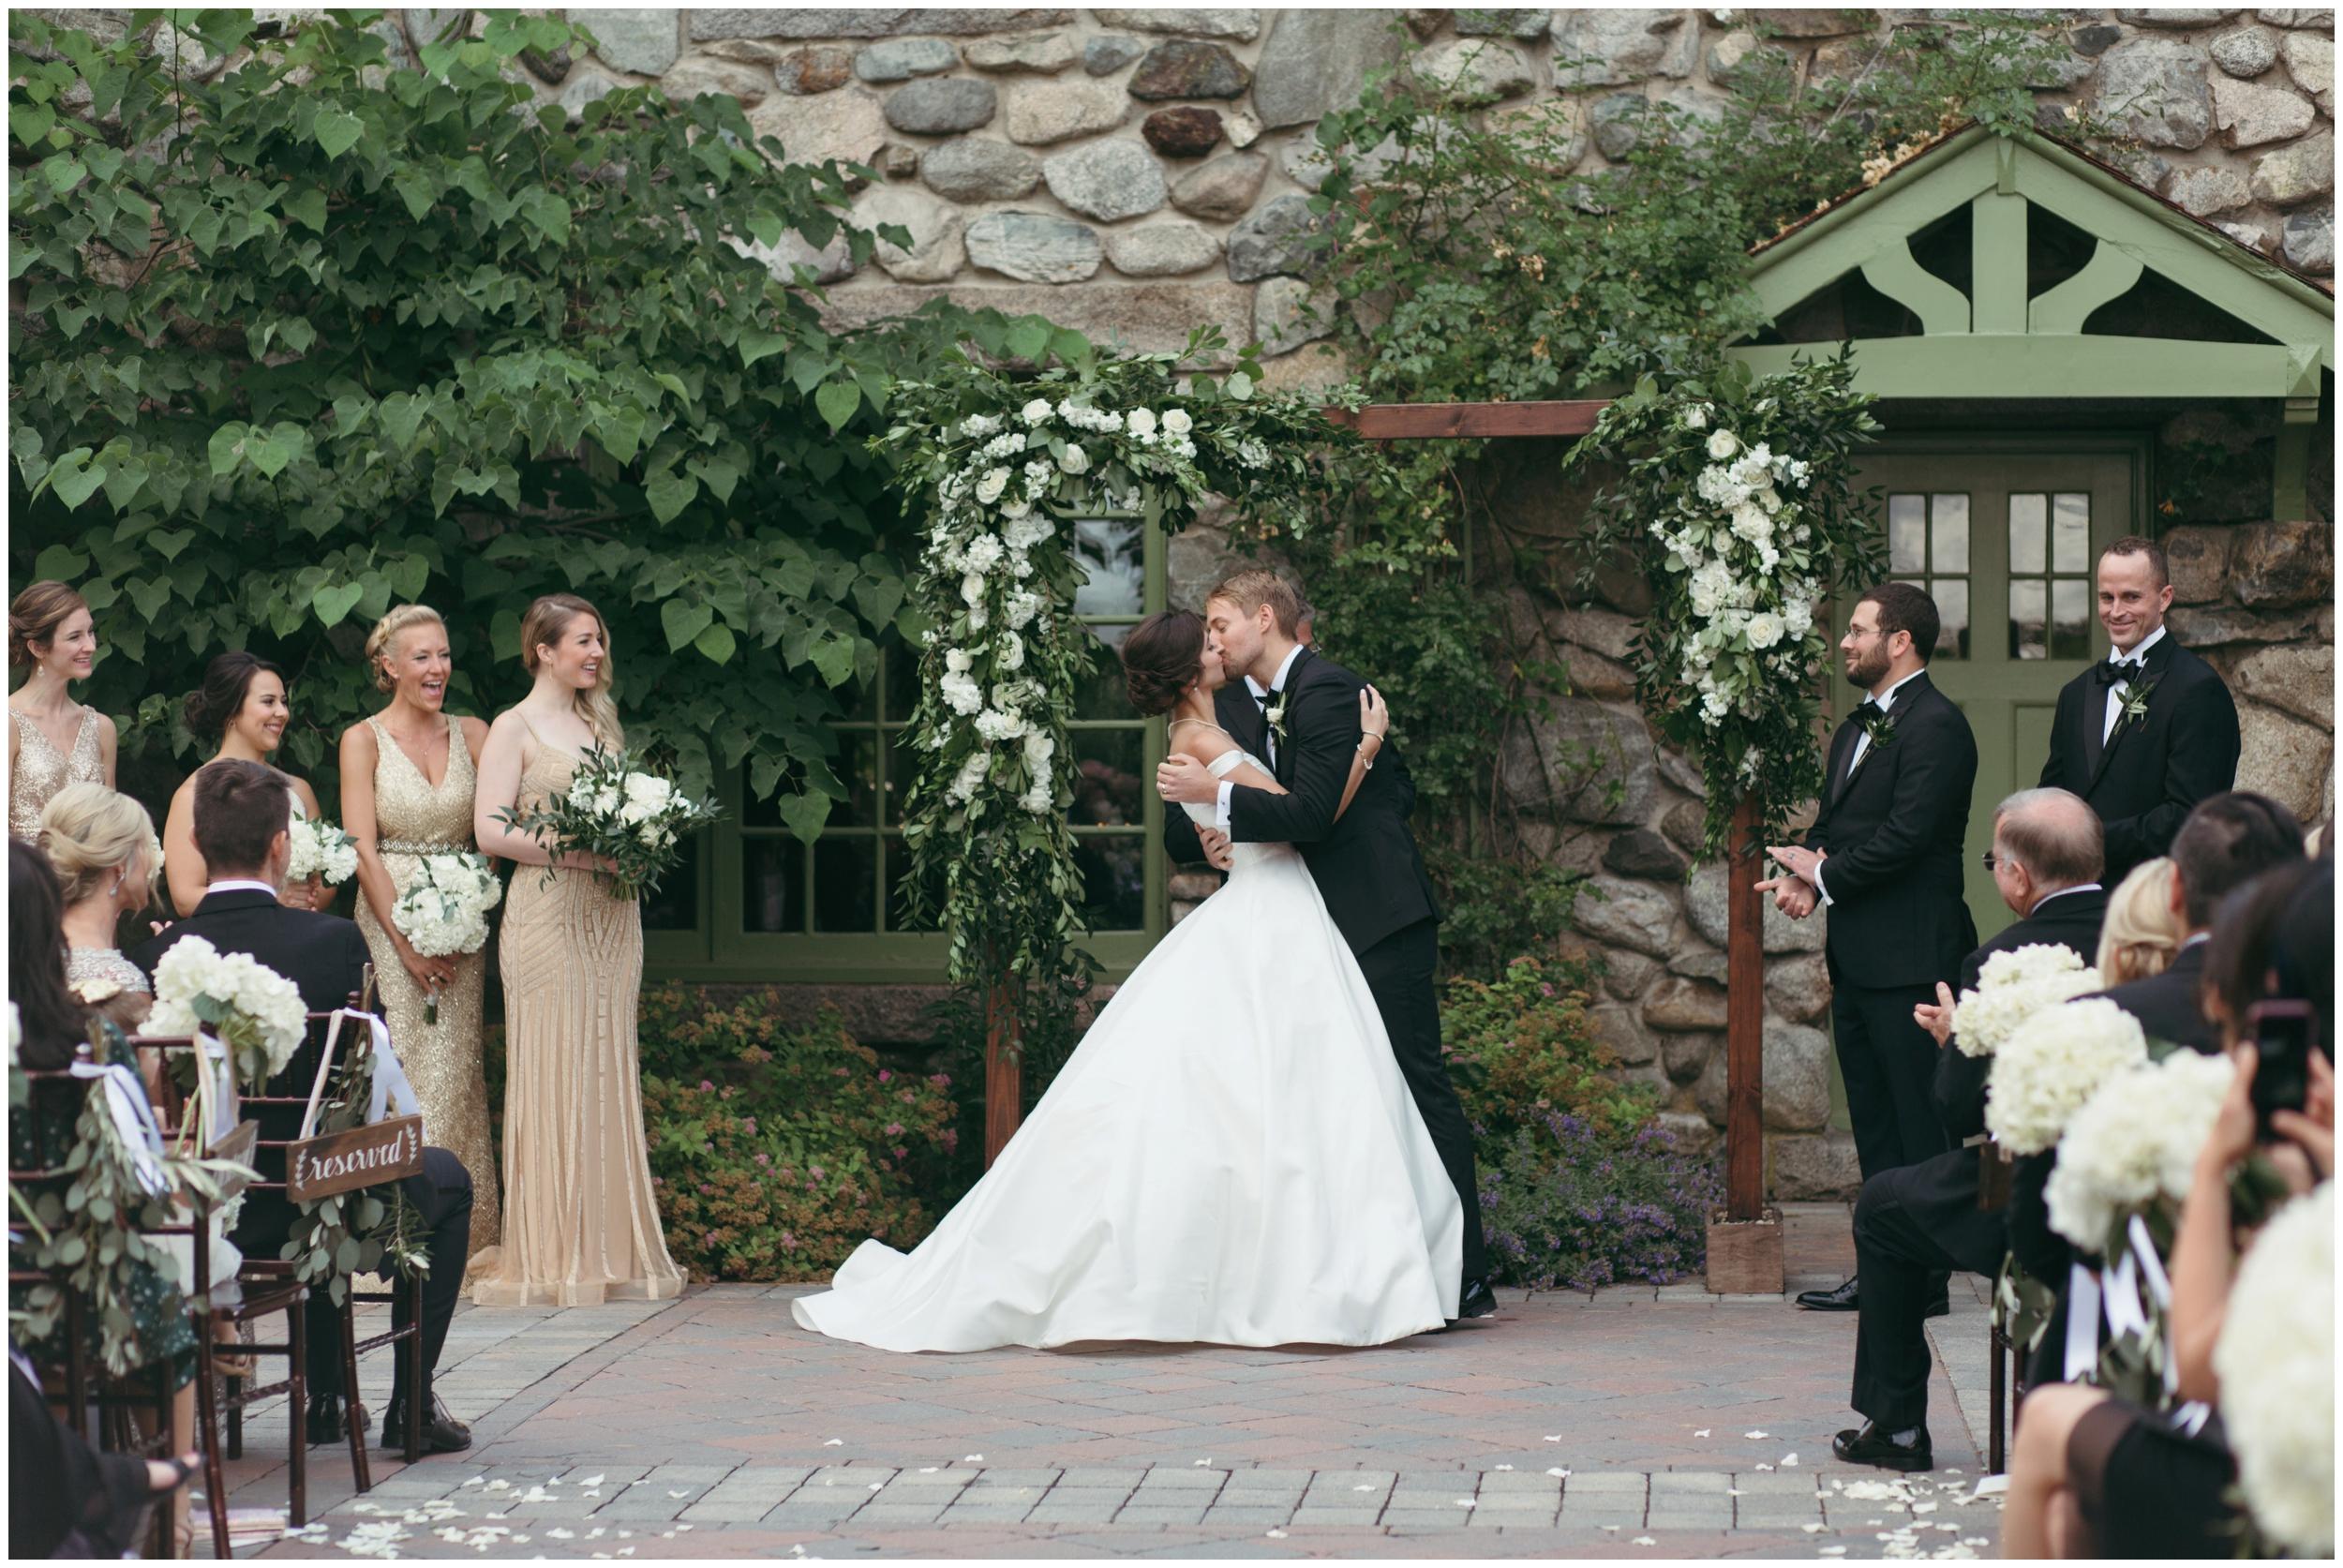 Willowdale-Estate-Wedding-Bailey-Q-Photo-Boston-Wedding-Photographer-044.JPG